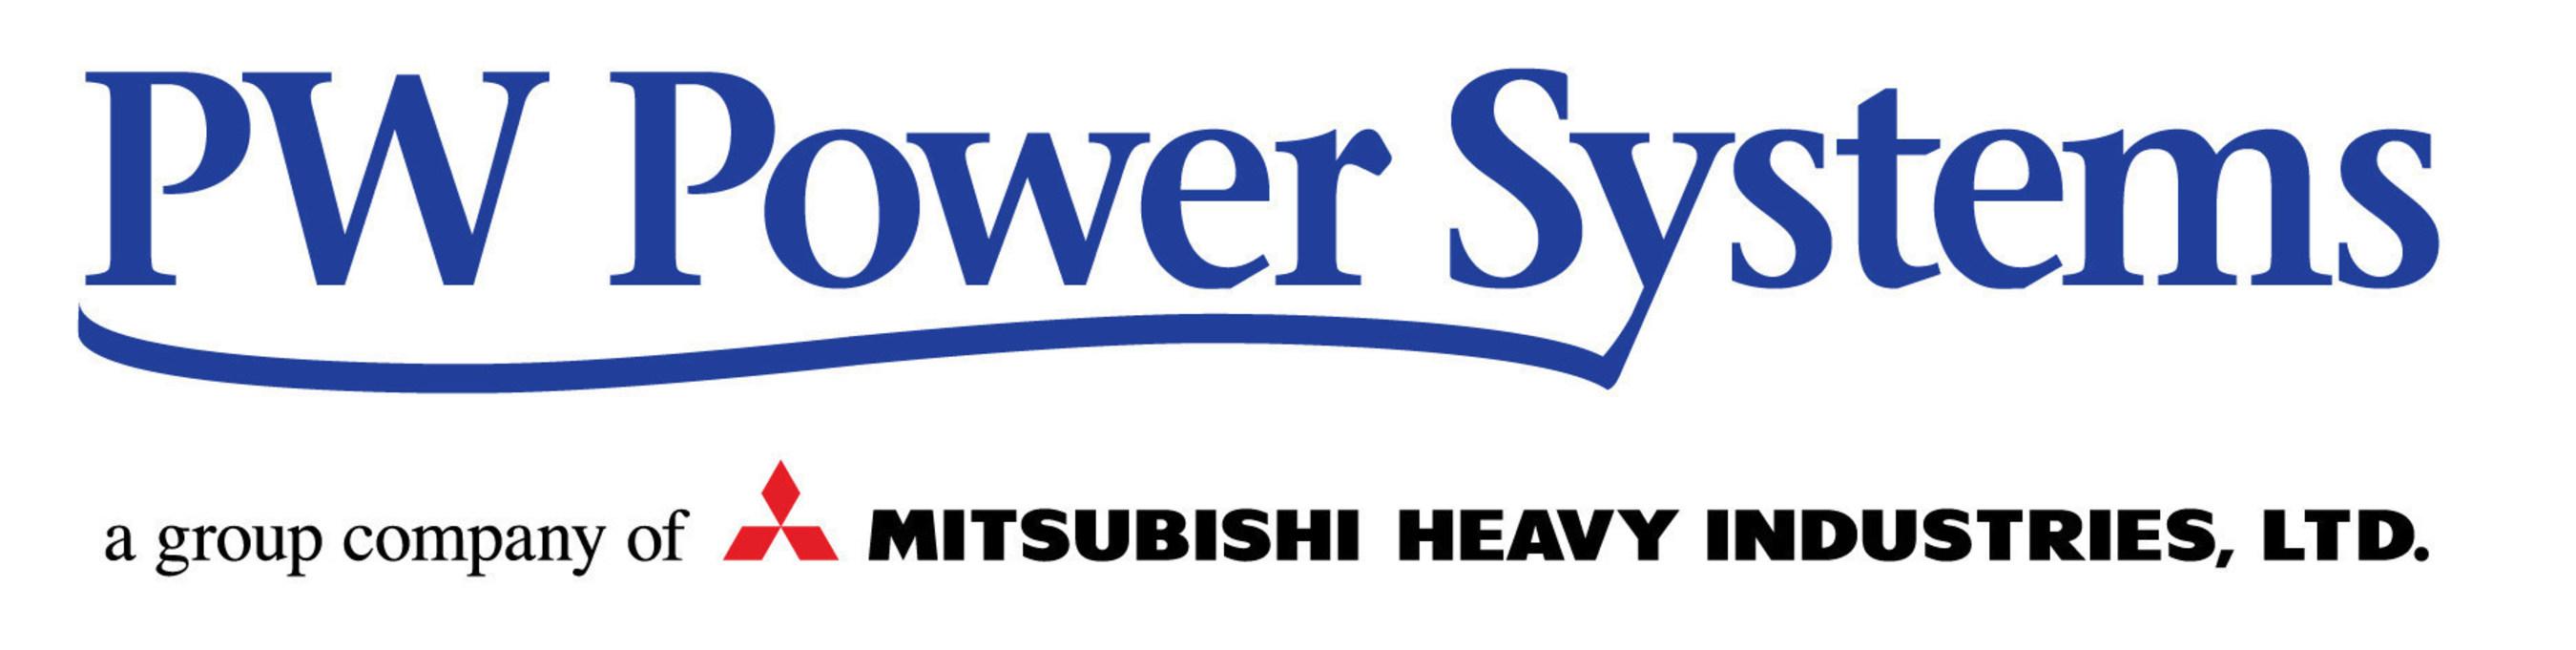 PW Power Systems Logo